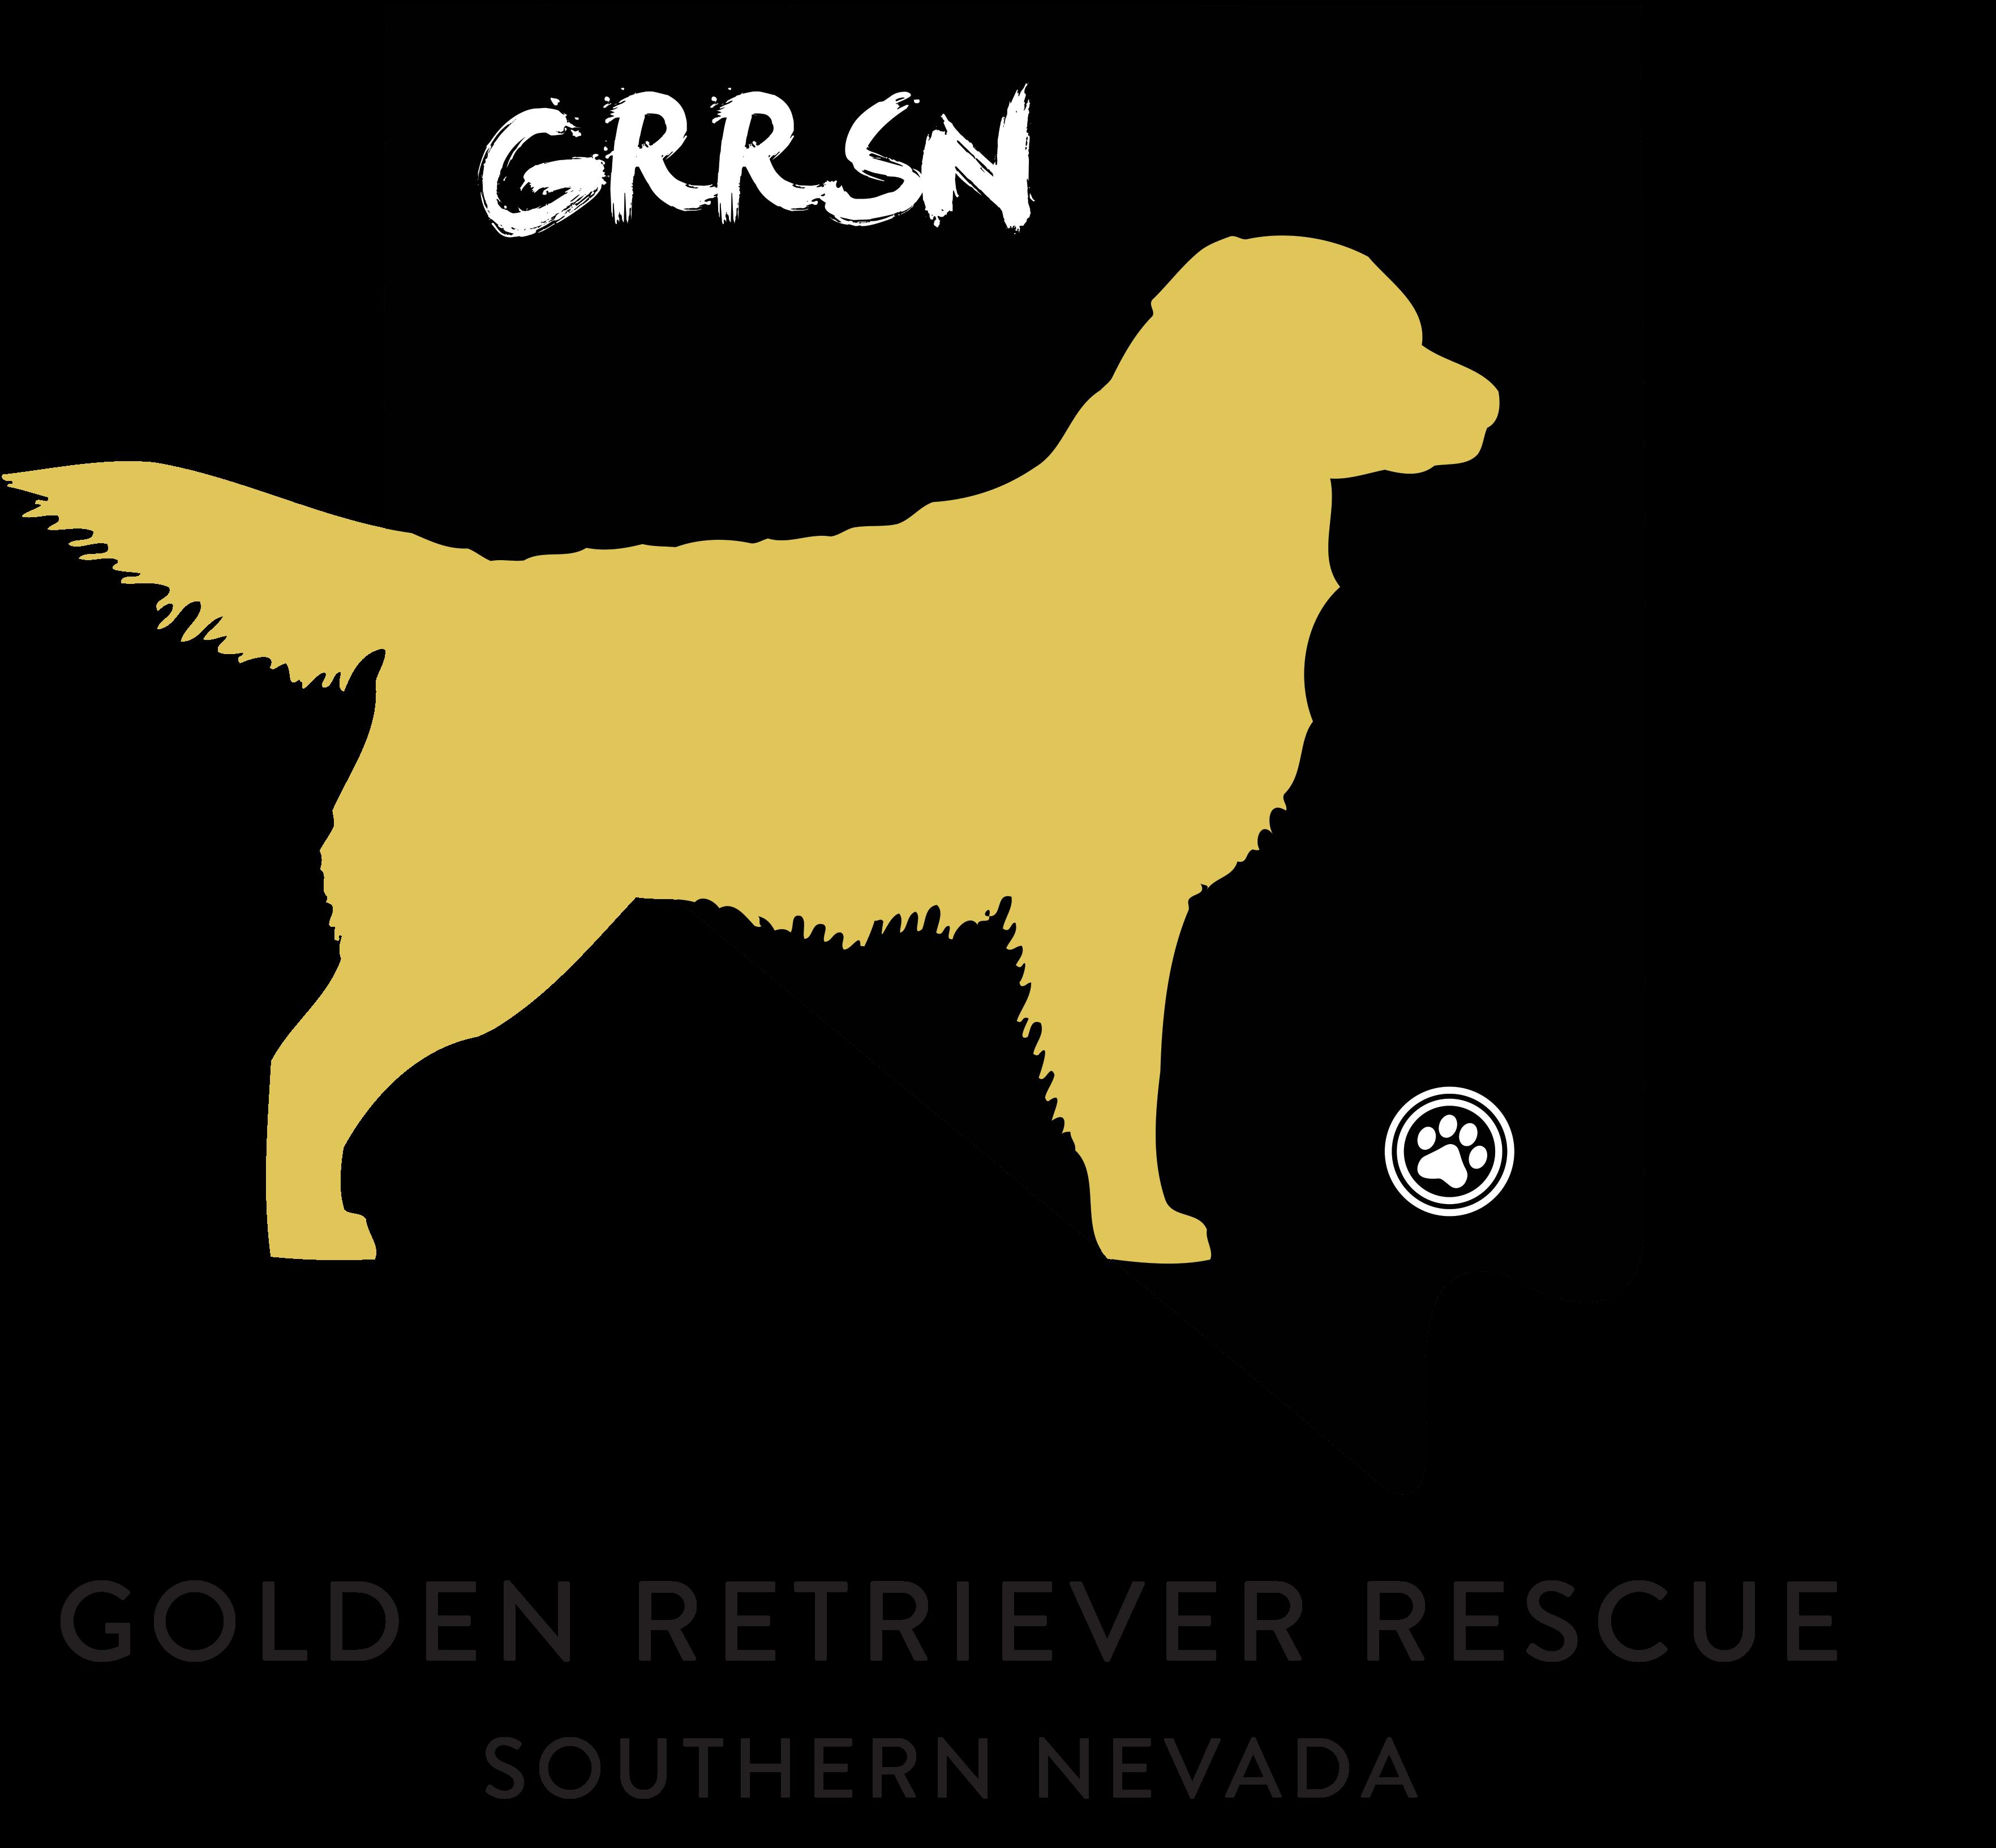 GRRSN – Golden Retriever Rescue Southern Nevada